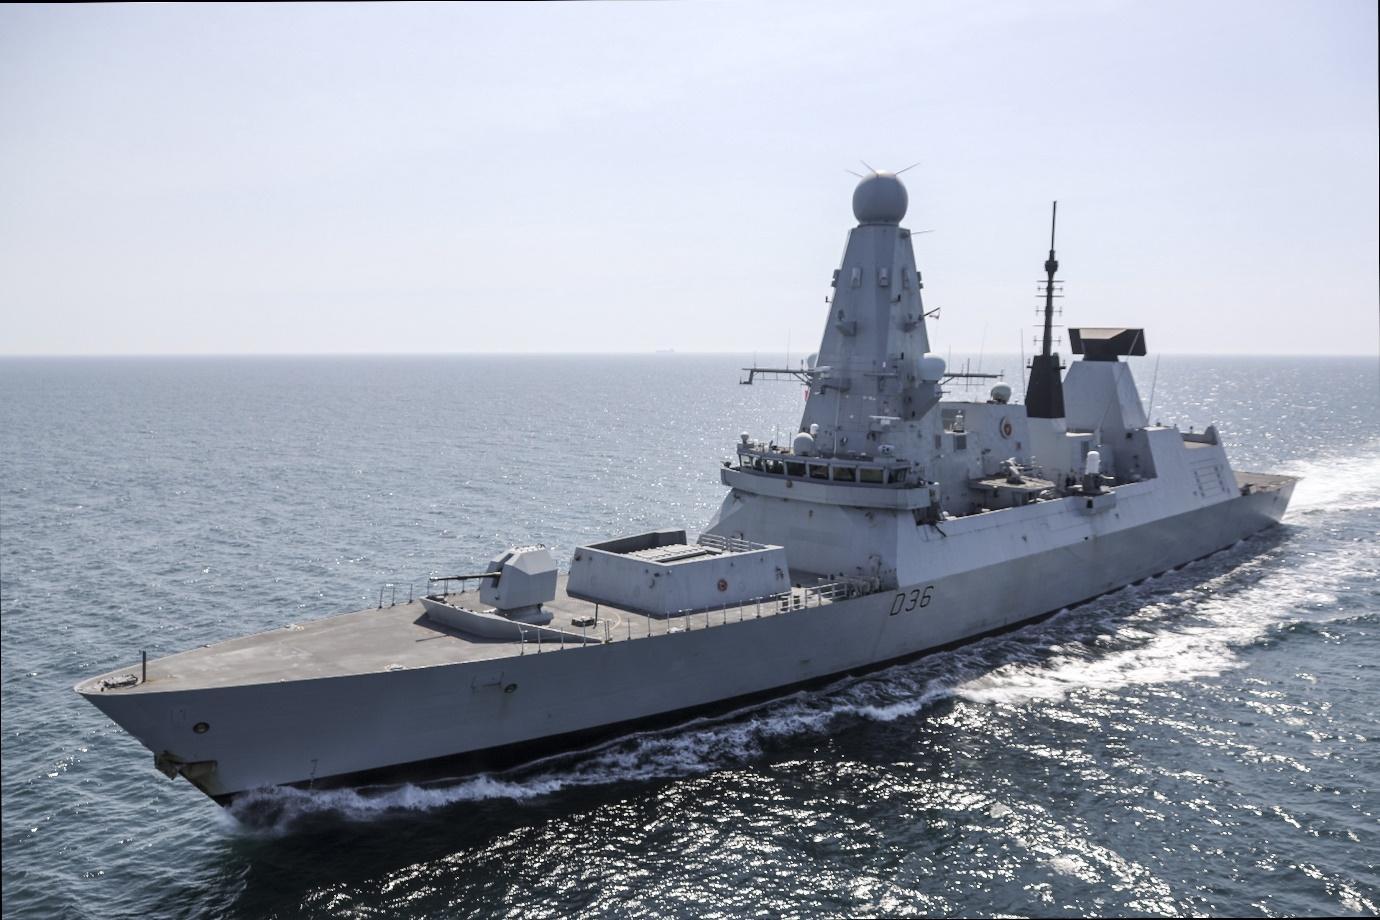 An image of HMS Defender.